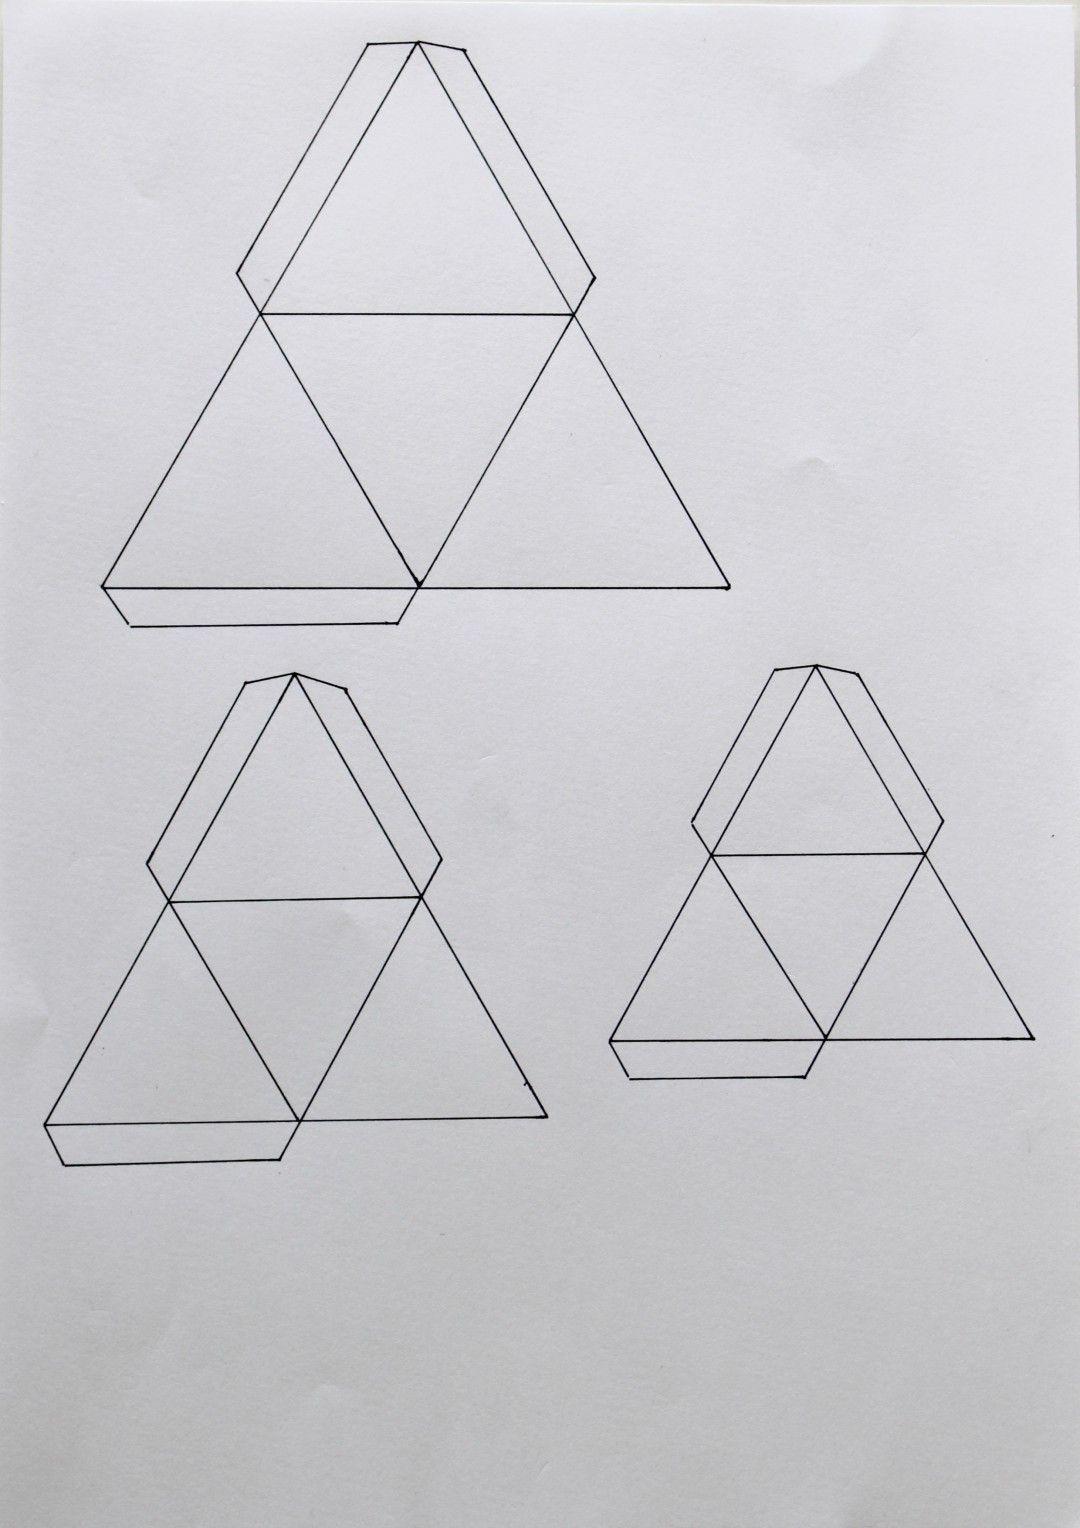 DIY PAPIER) Décoration triangulaire | Origami, Papercraft and Craft